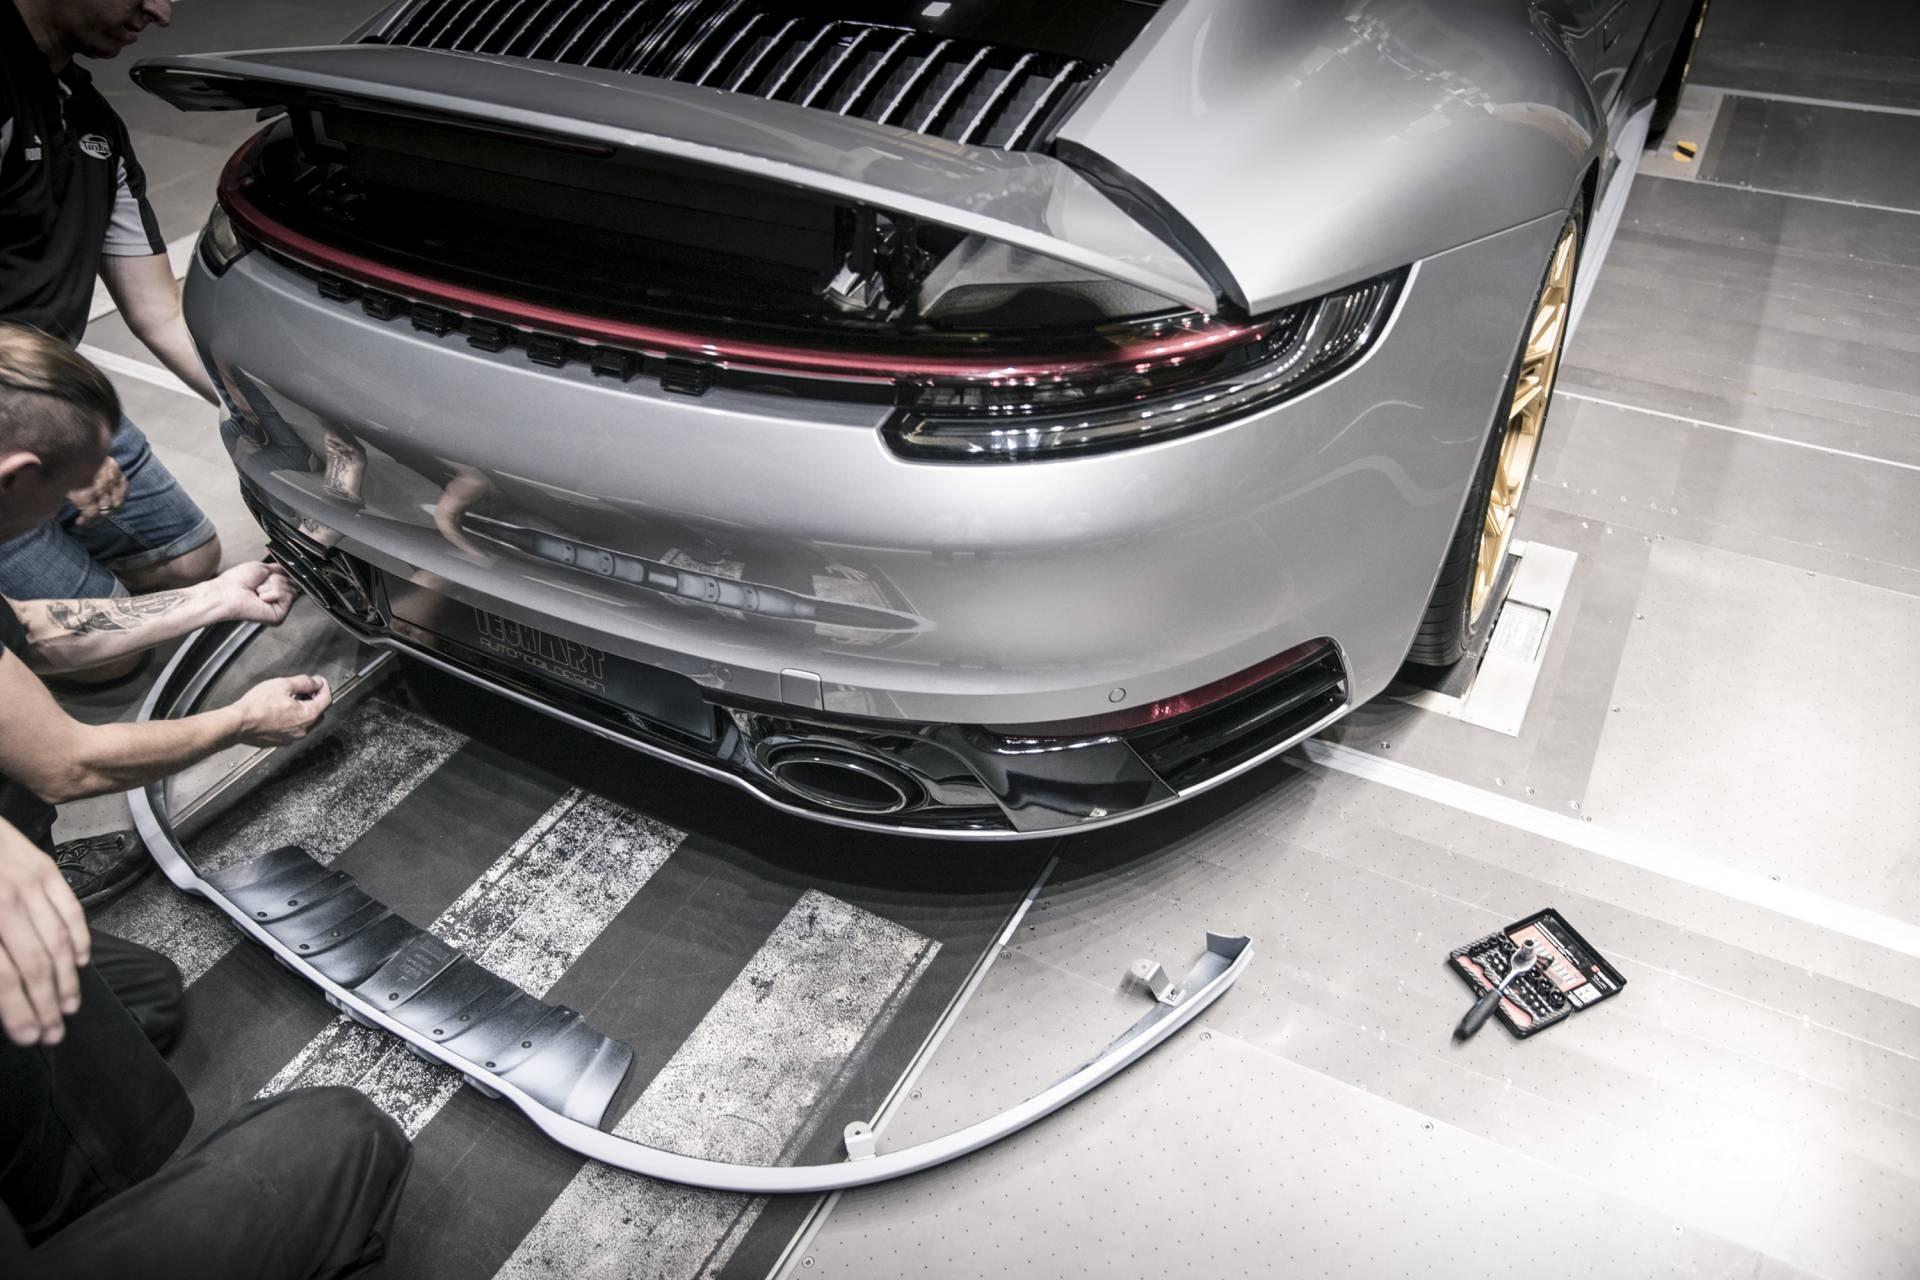 Chi tiet Porsche 911 2020 lot xac man nhan voi goi do thu cong hinh anh 12